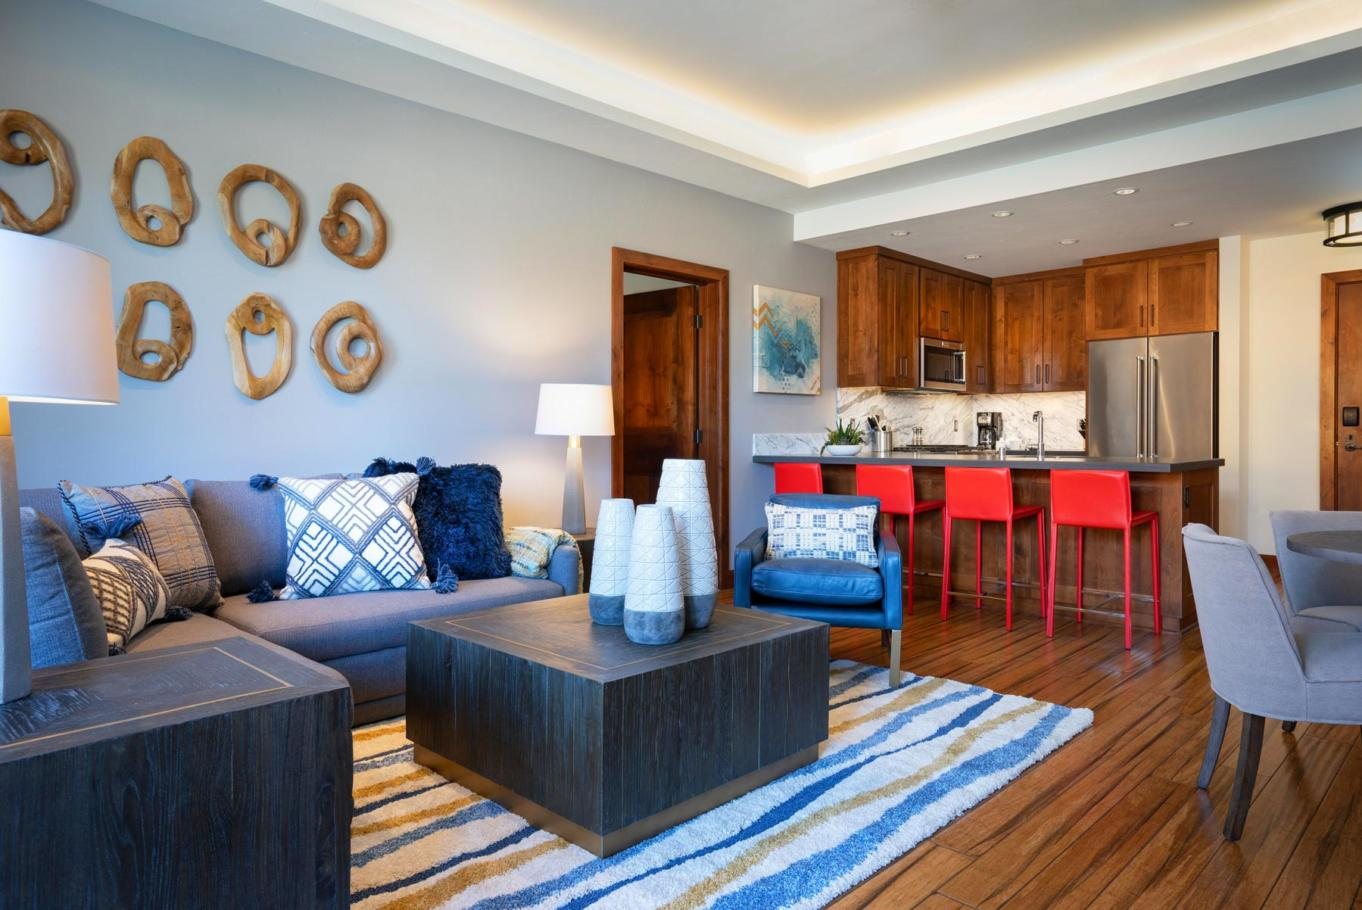 Zalanta Living Room Design by Talie Jane Interiors